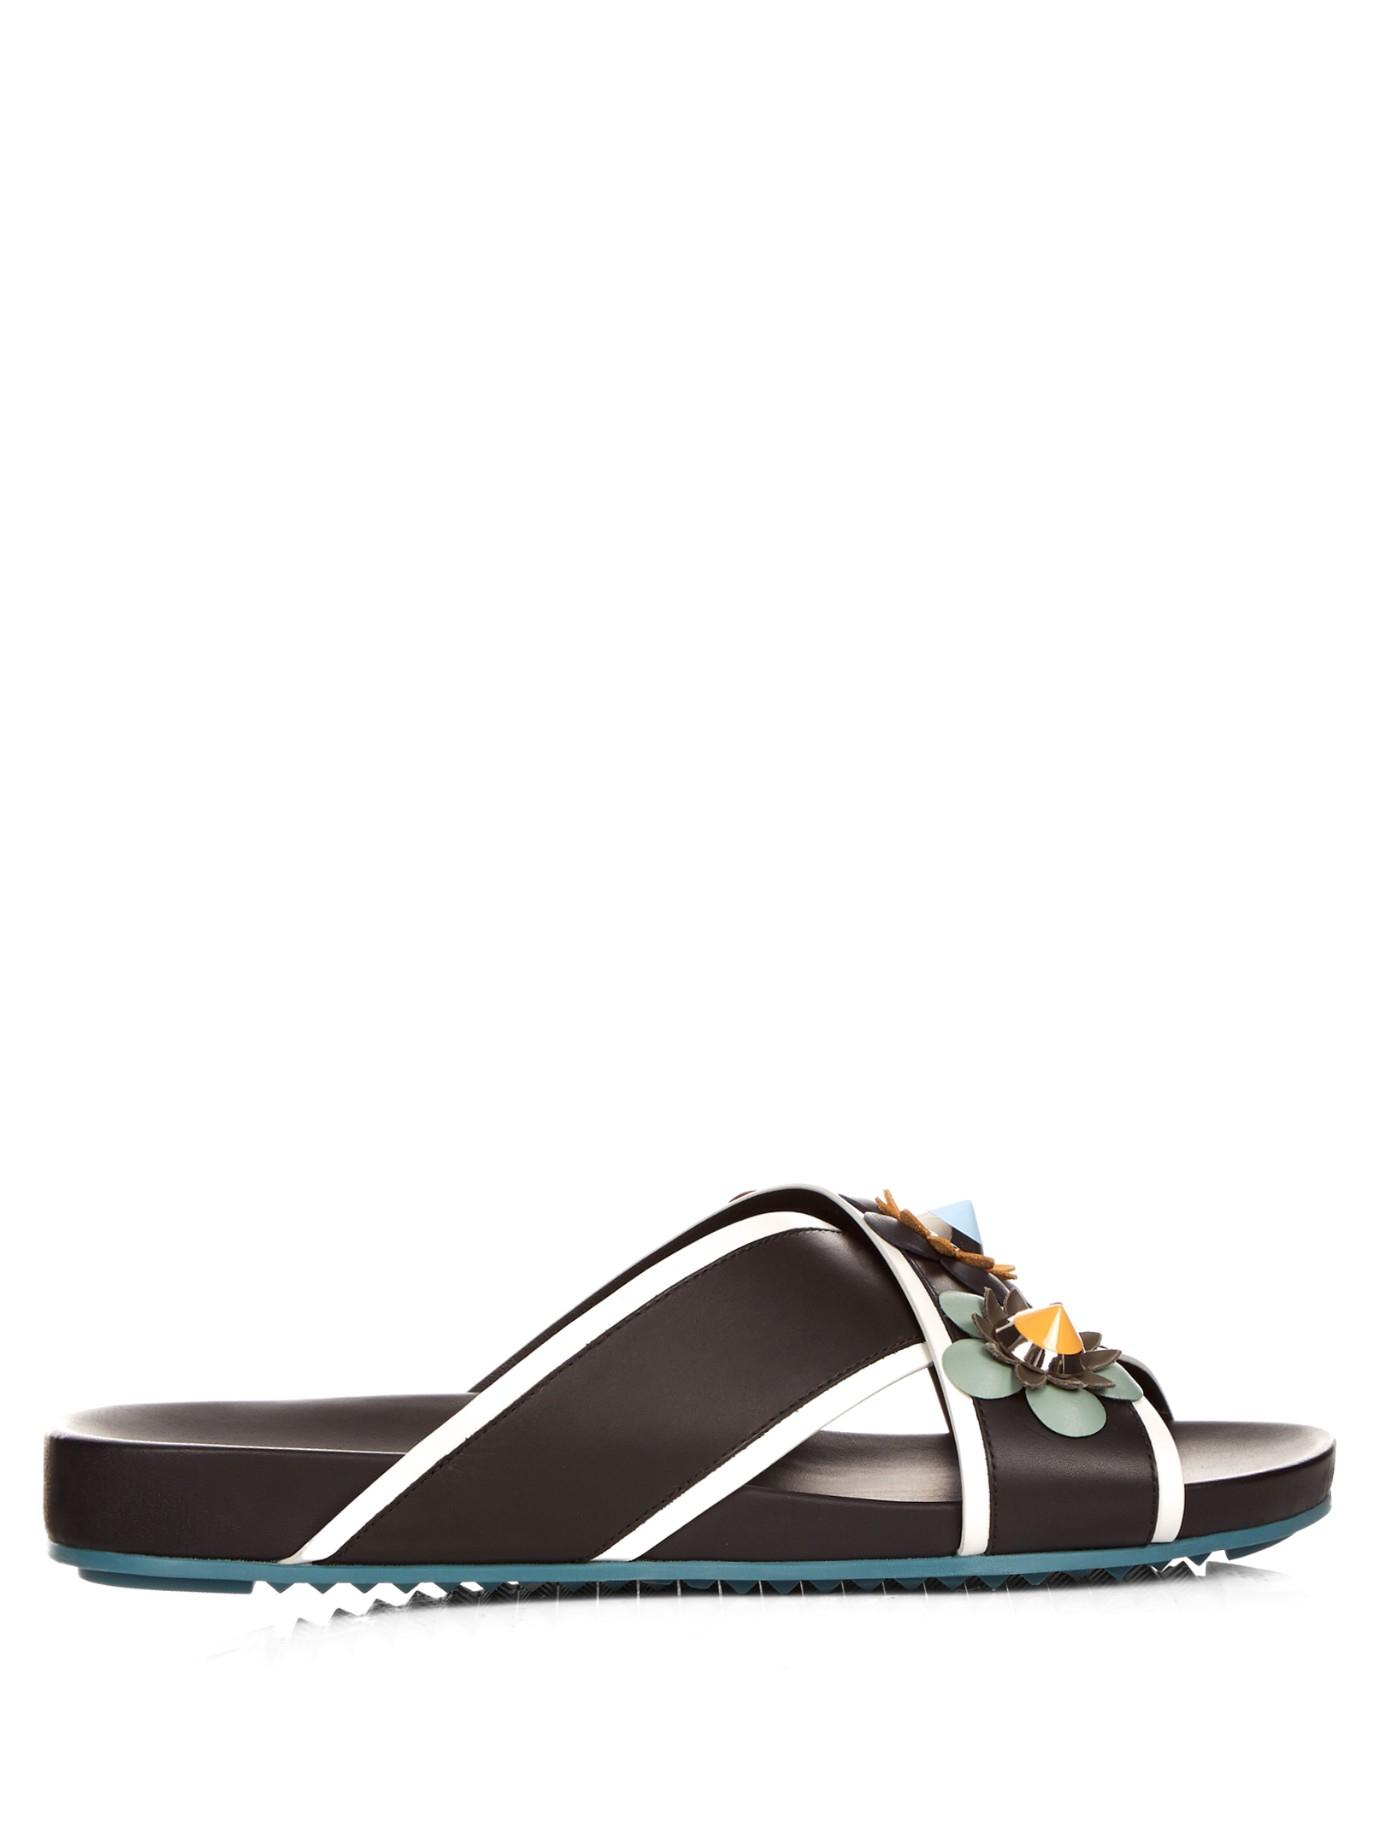 Fendi Shoes Outlet Uk